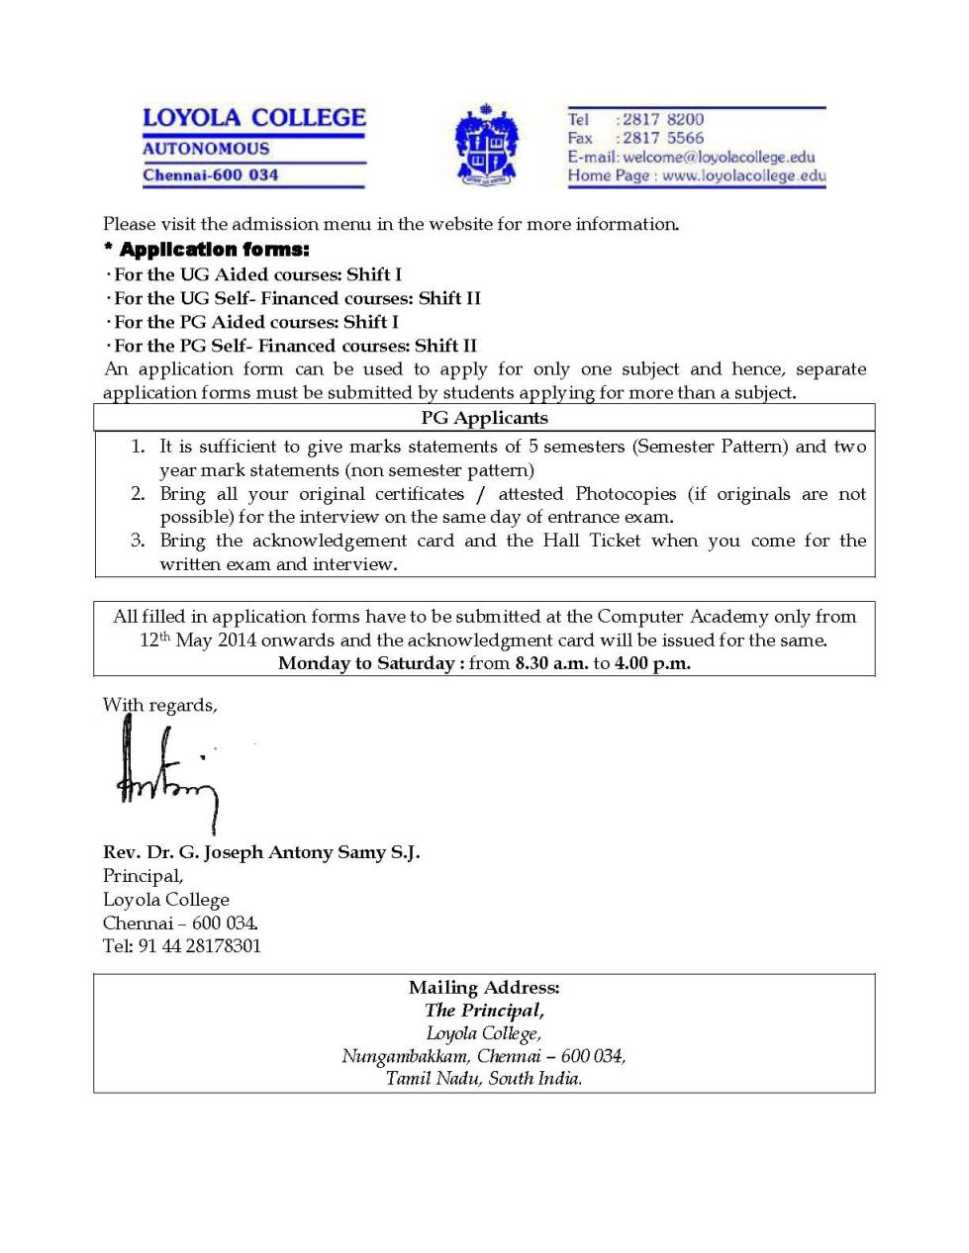 Loyola-College-Chennai-Admission-Form-Date-2 Bhu Sports Application Form on naksha uttar pradesh, top college, vishwanath temple, birla hostel, naksha jharkhand, hospital banaras, answer sheet,